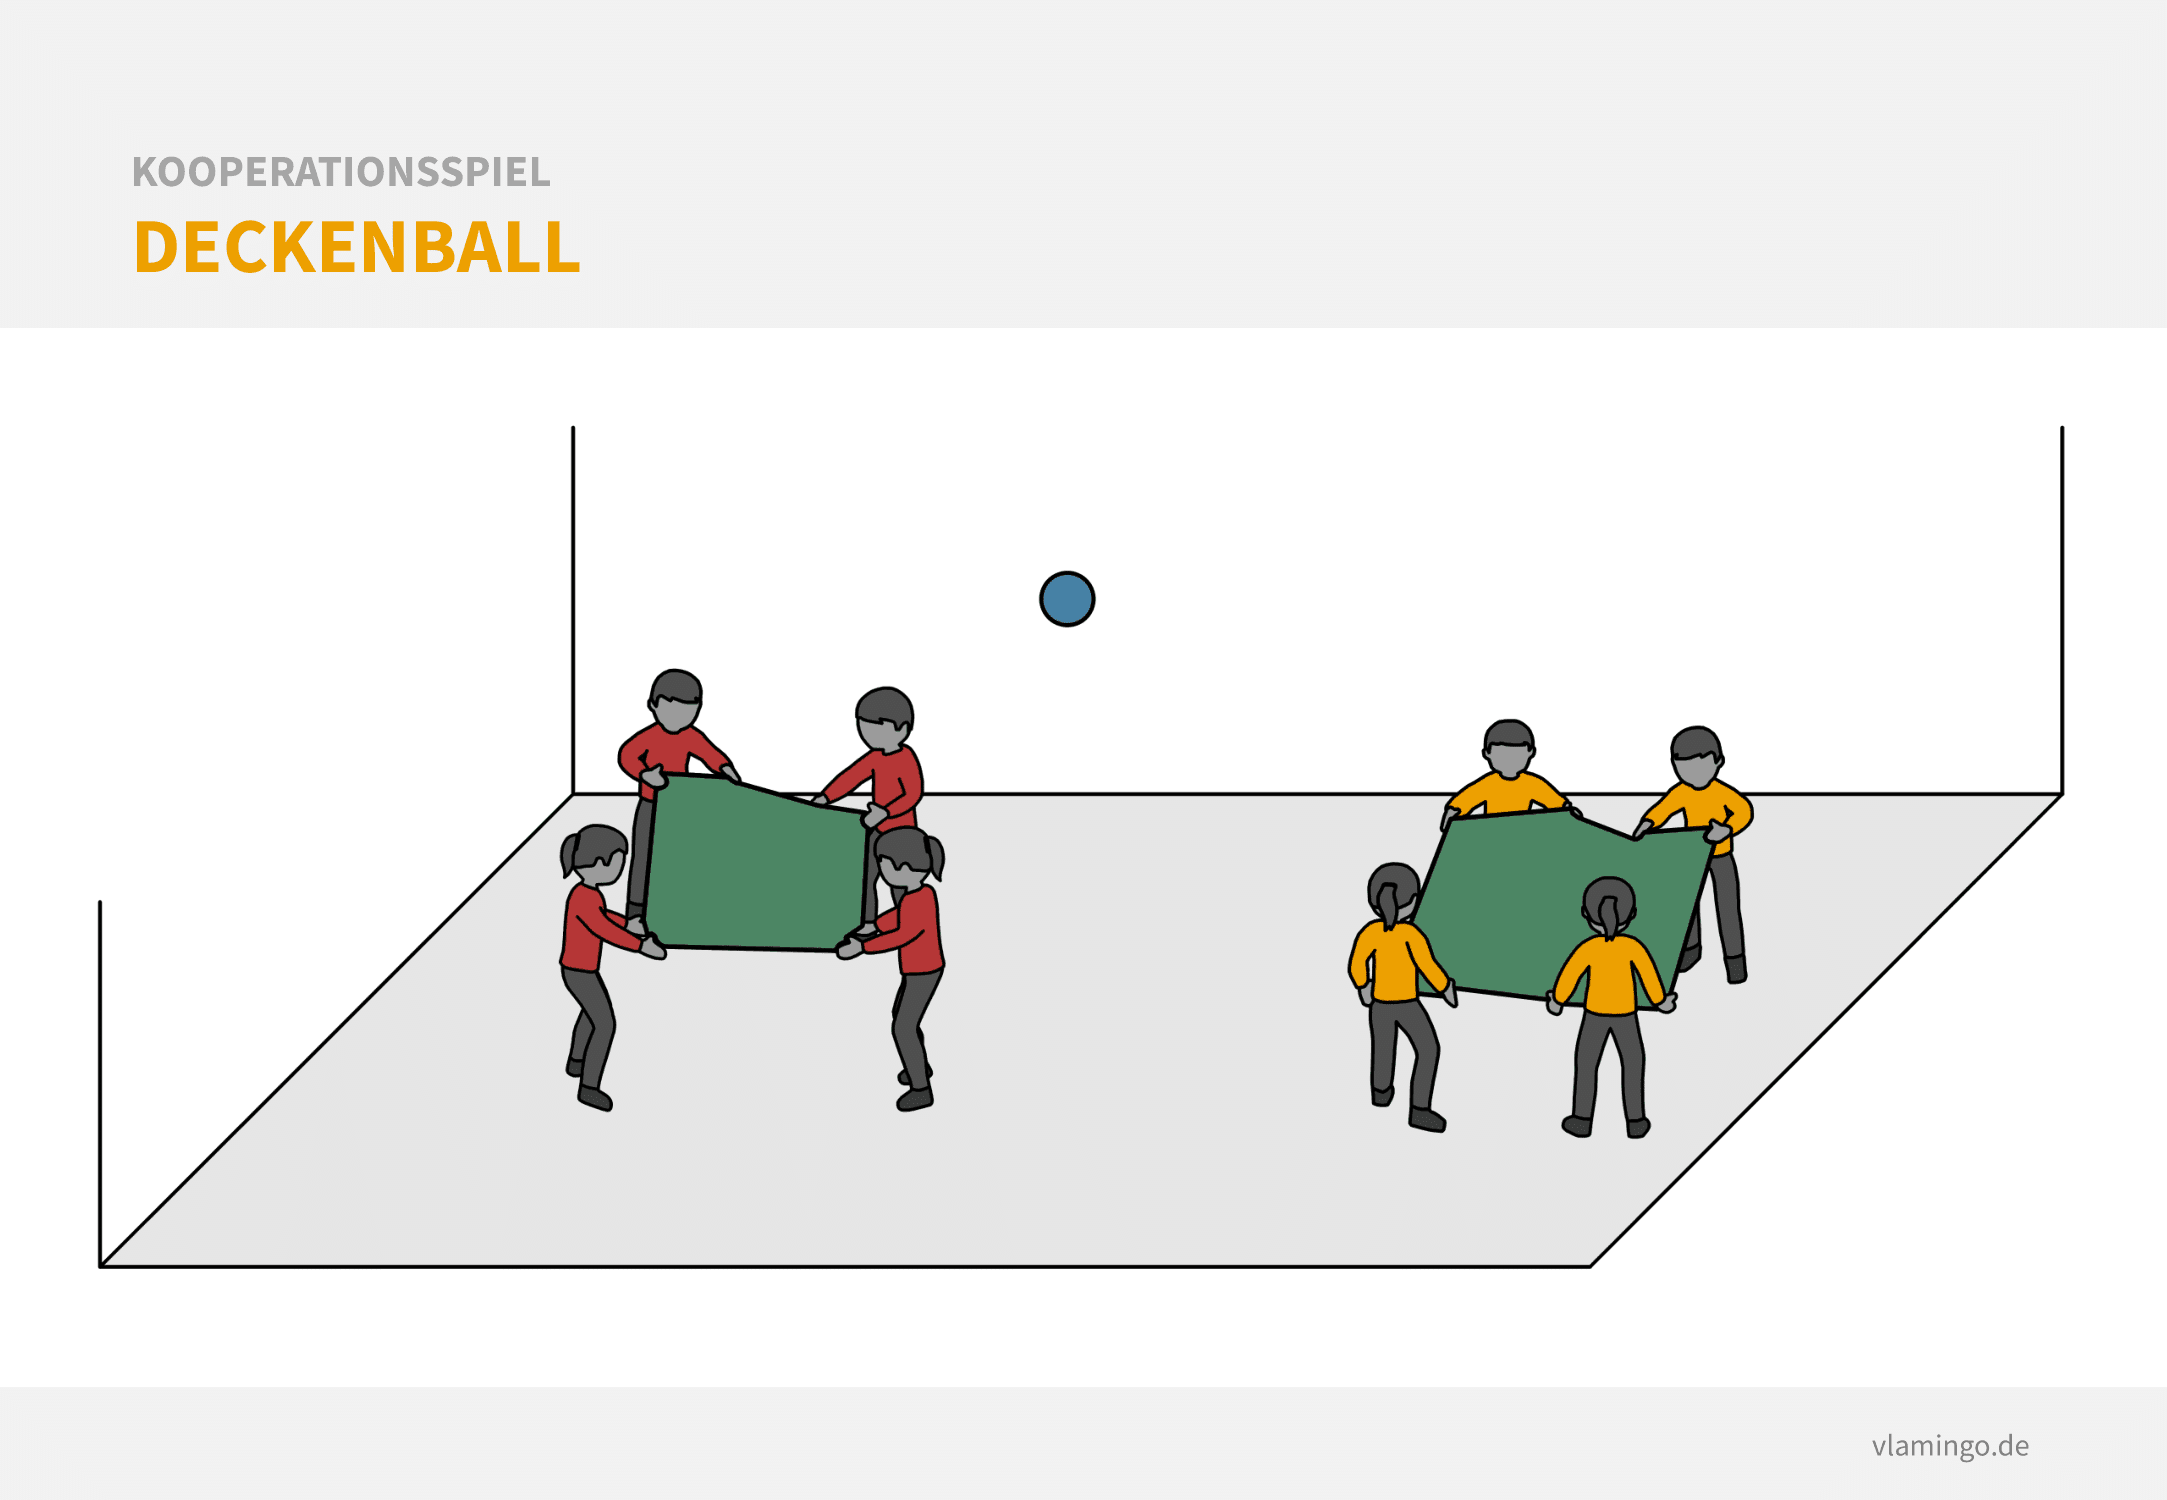 Kooperationsspiel: Deckenball